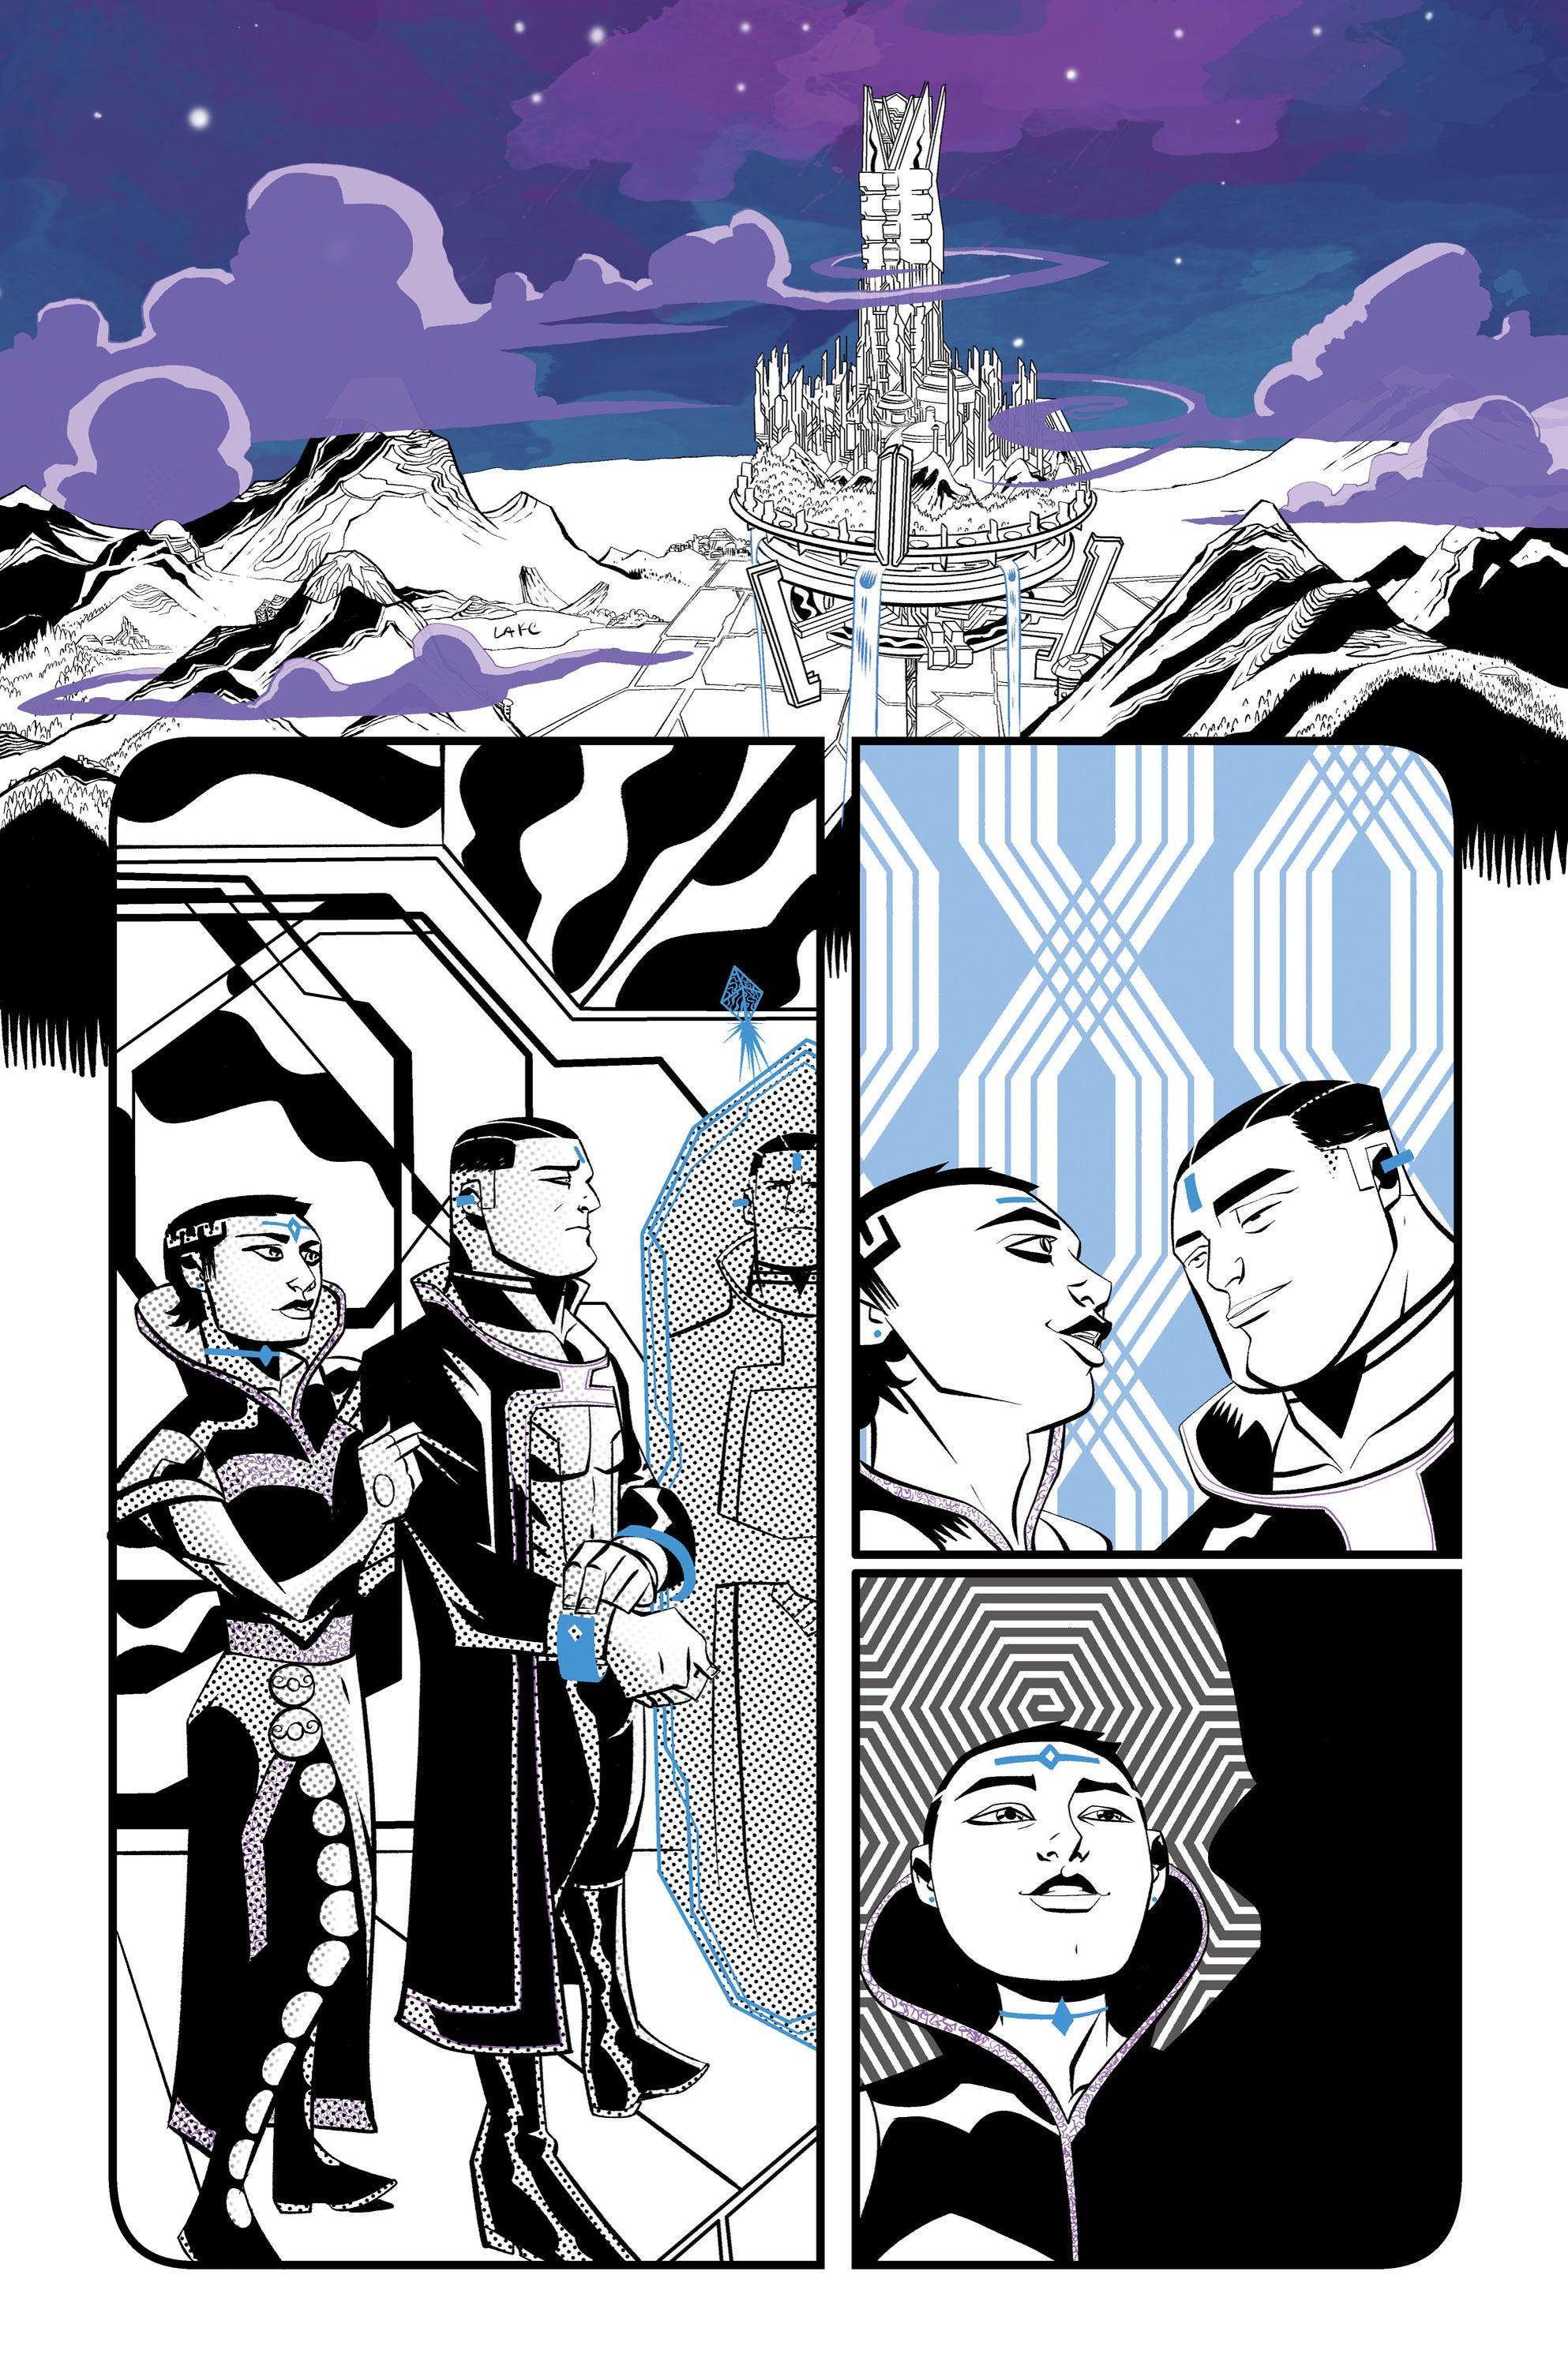 world-of-krypton-1-04.jpg